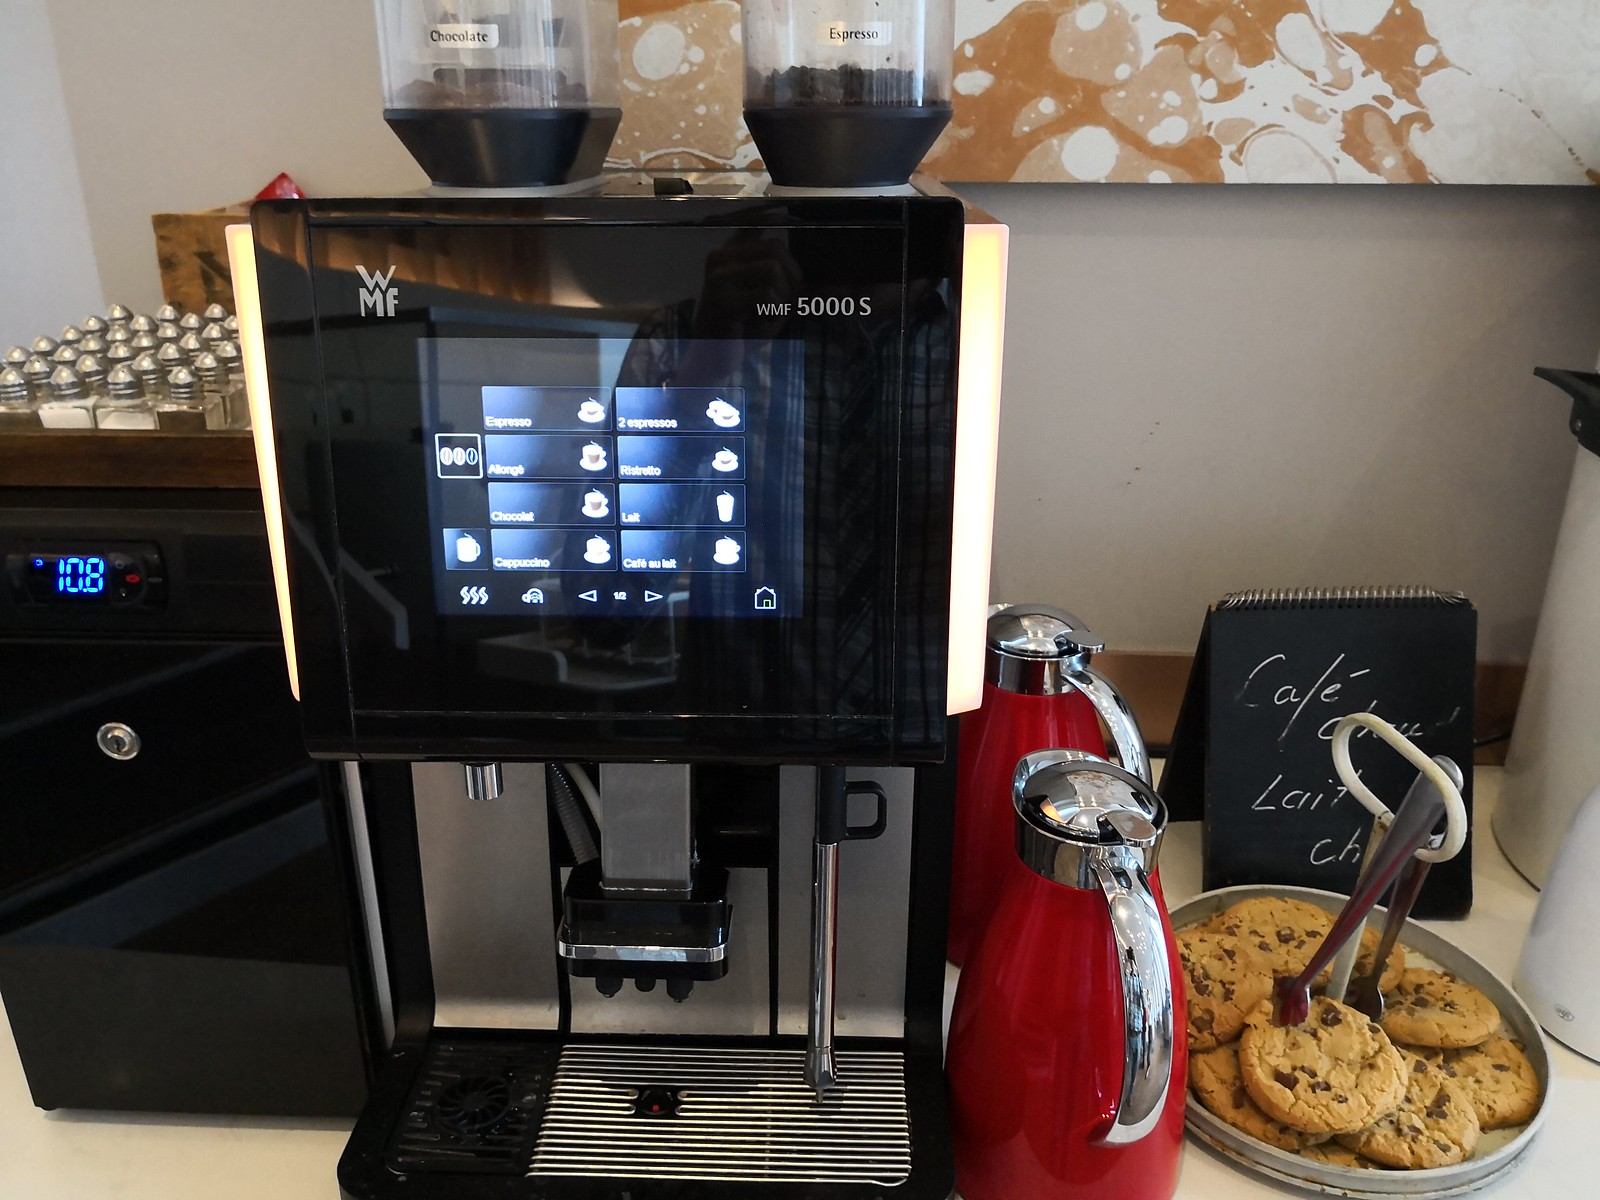 Espresso machine and cookies